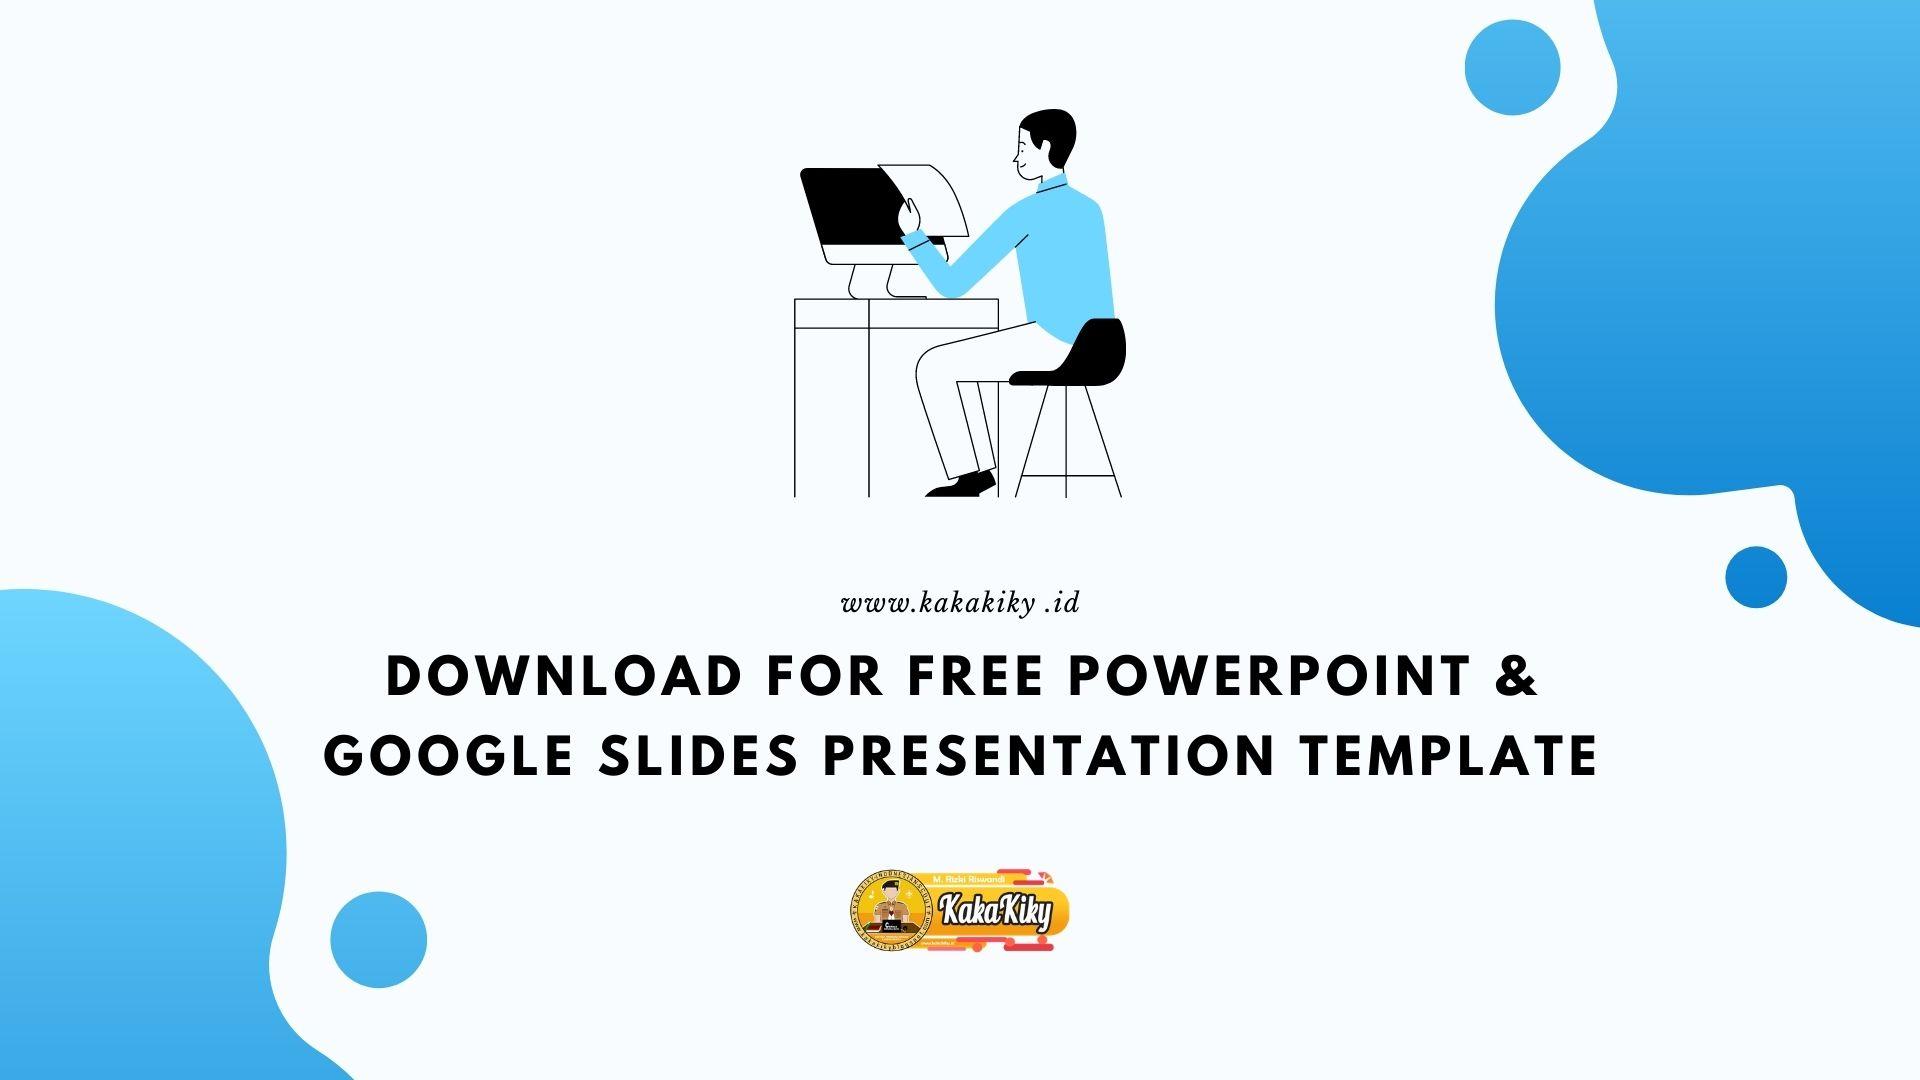 30 Template Presentasi Power Point Ppt Dan Google Slide Tema Edukasi Gratis Kakakiky Blog Edukasi